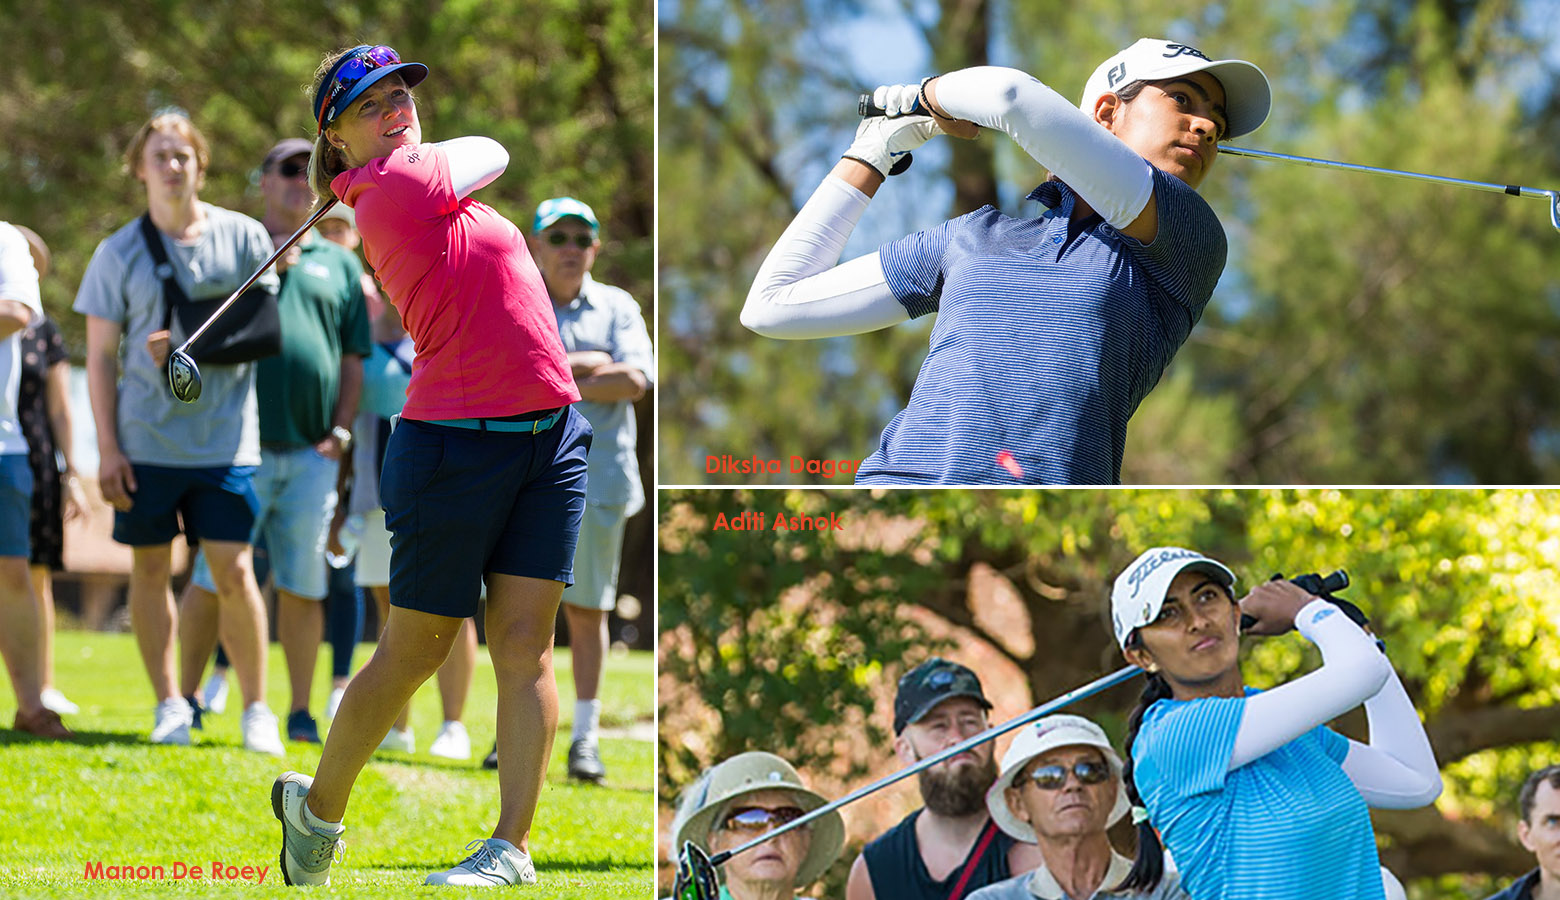 Diksha Dagar is fourth and Aditi eighth in New South Wales Open